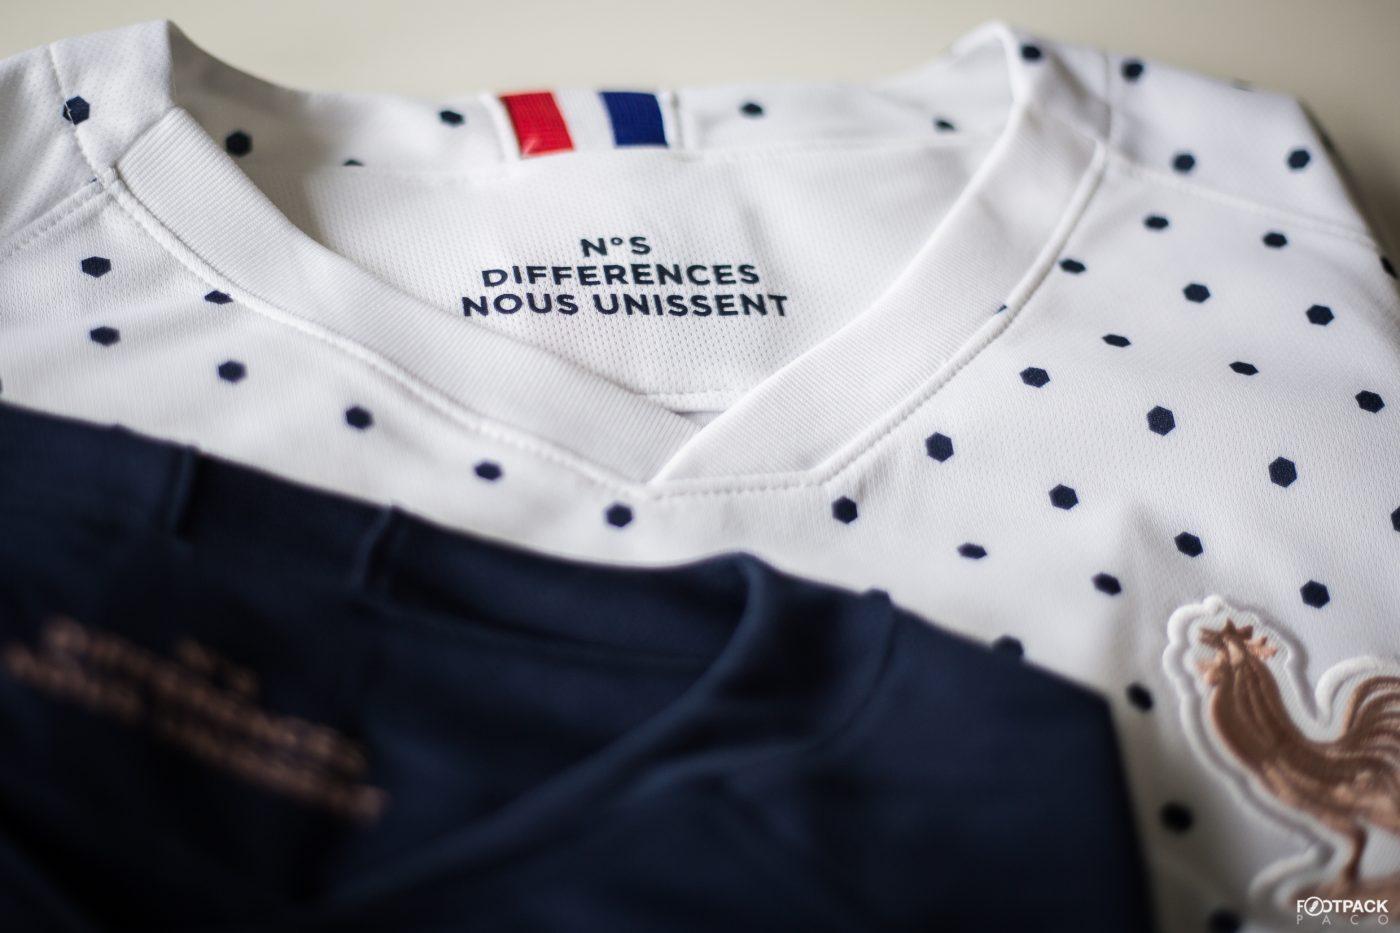 signification-nos-differences-nous-unissent-maillot-france-coupe-du-monde-feminine-nike-7